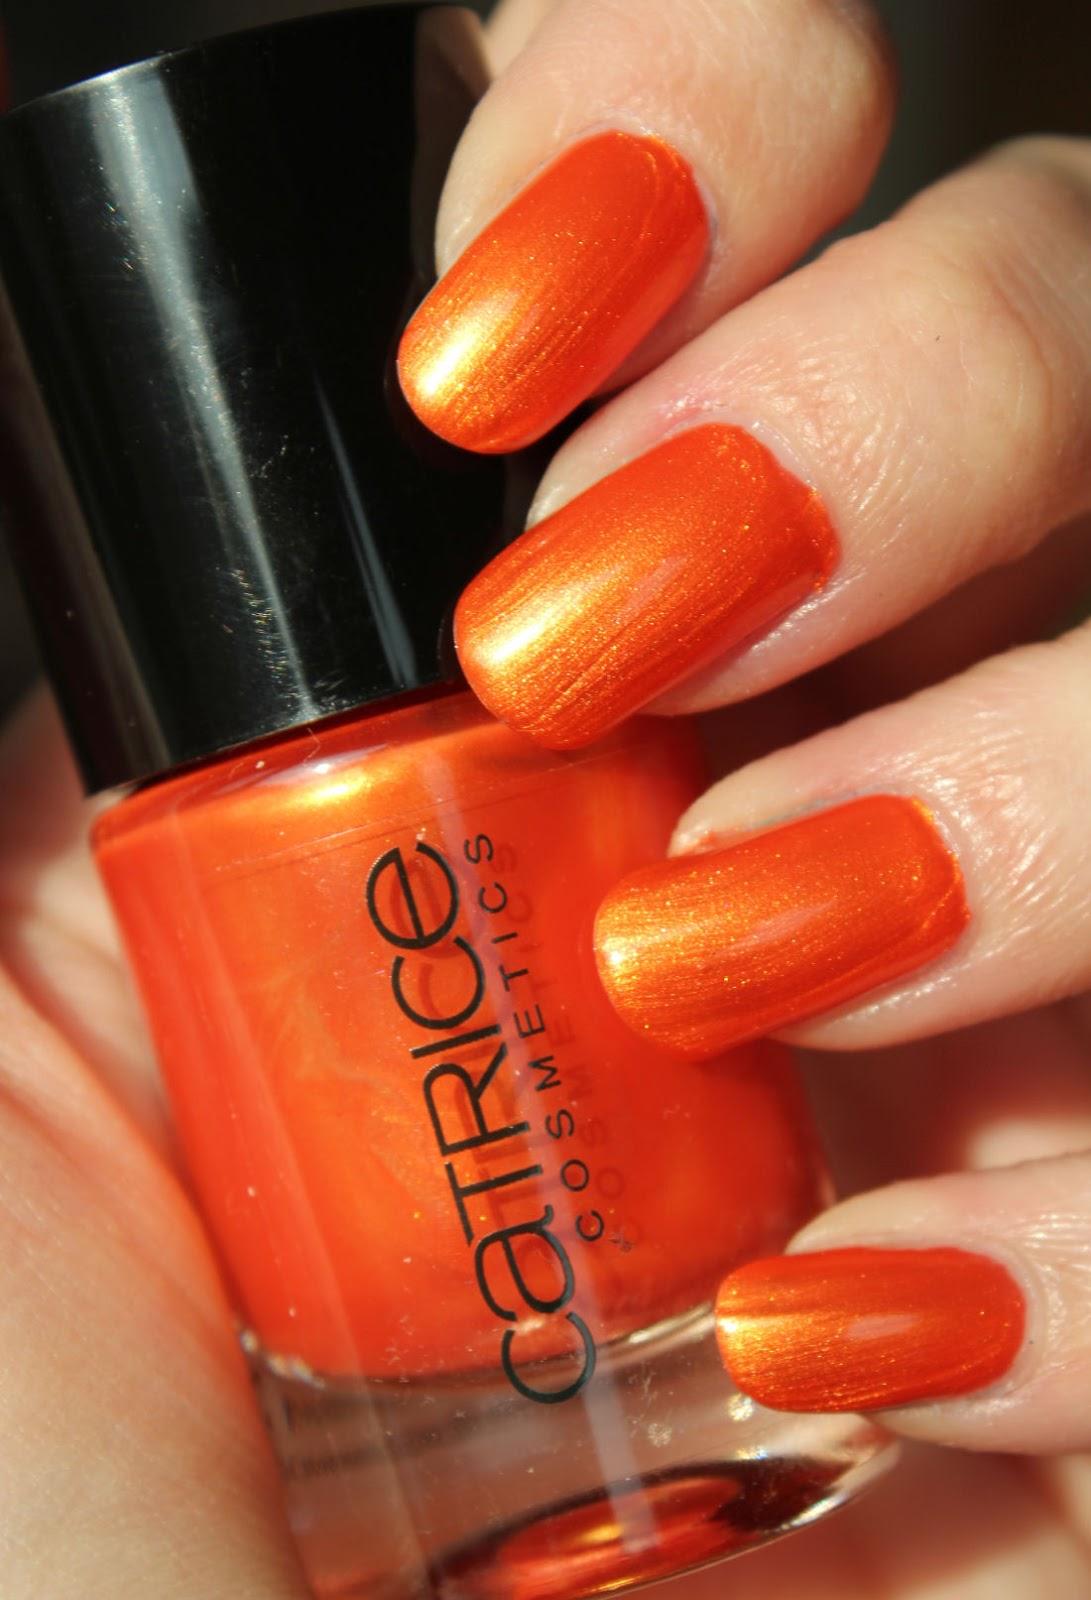 http://lacquediction.blogspot.de/2014/03/catrice-ultimate-nail-lacquer-47-orango.html